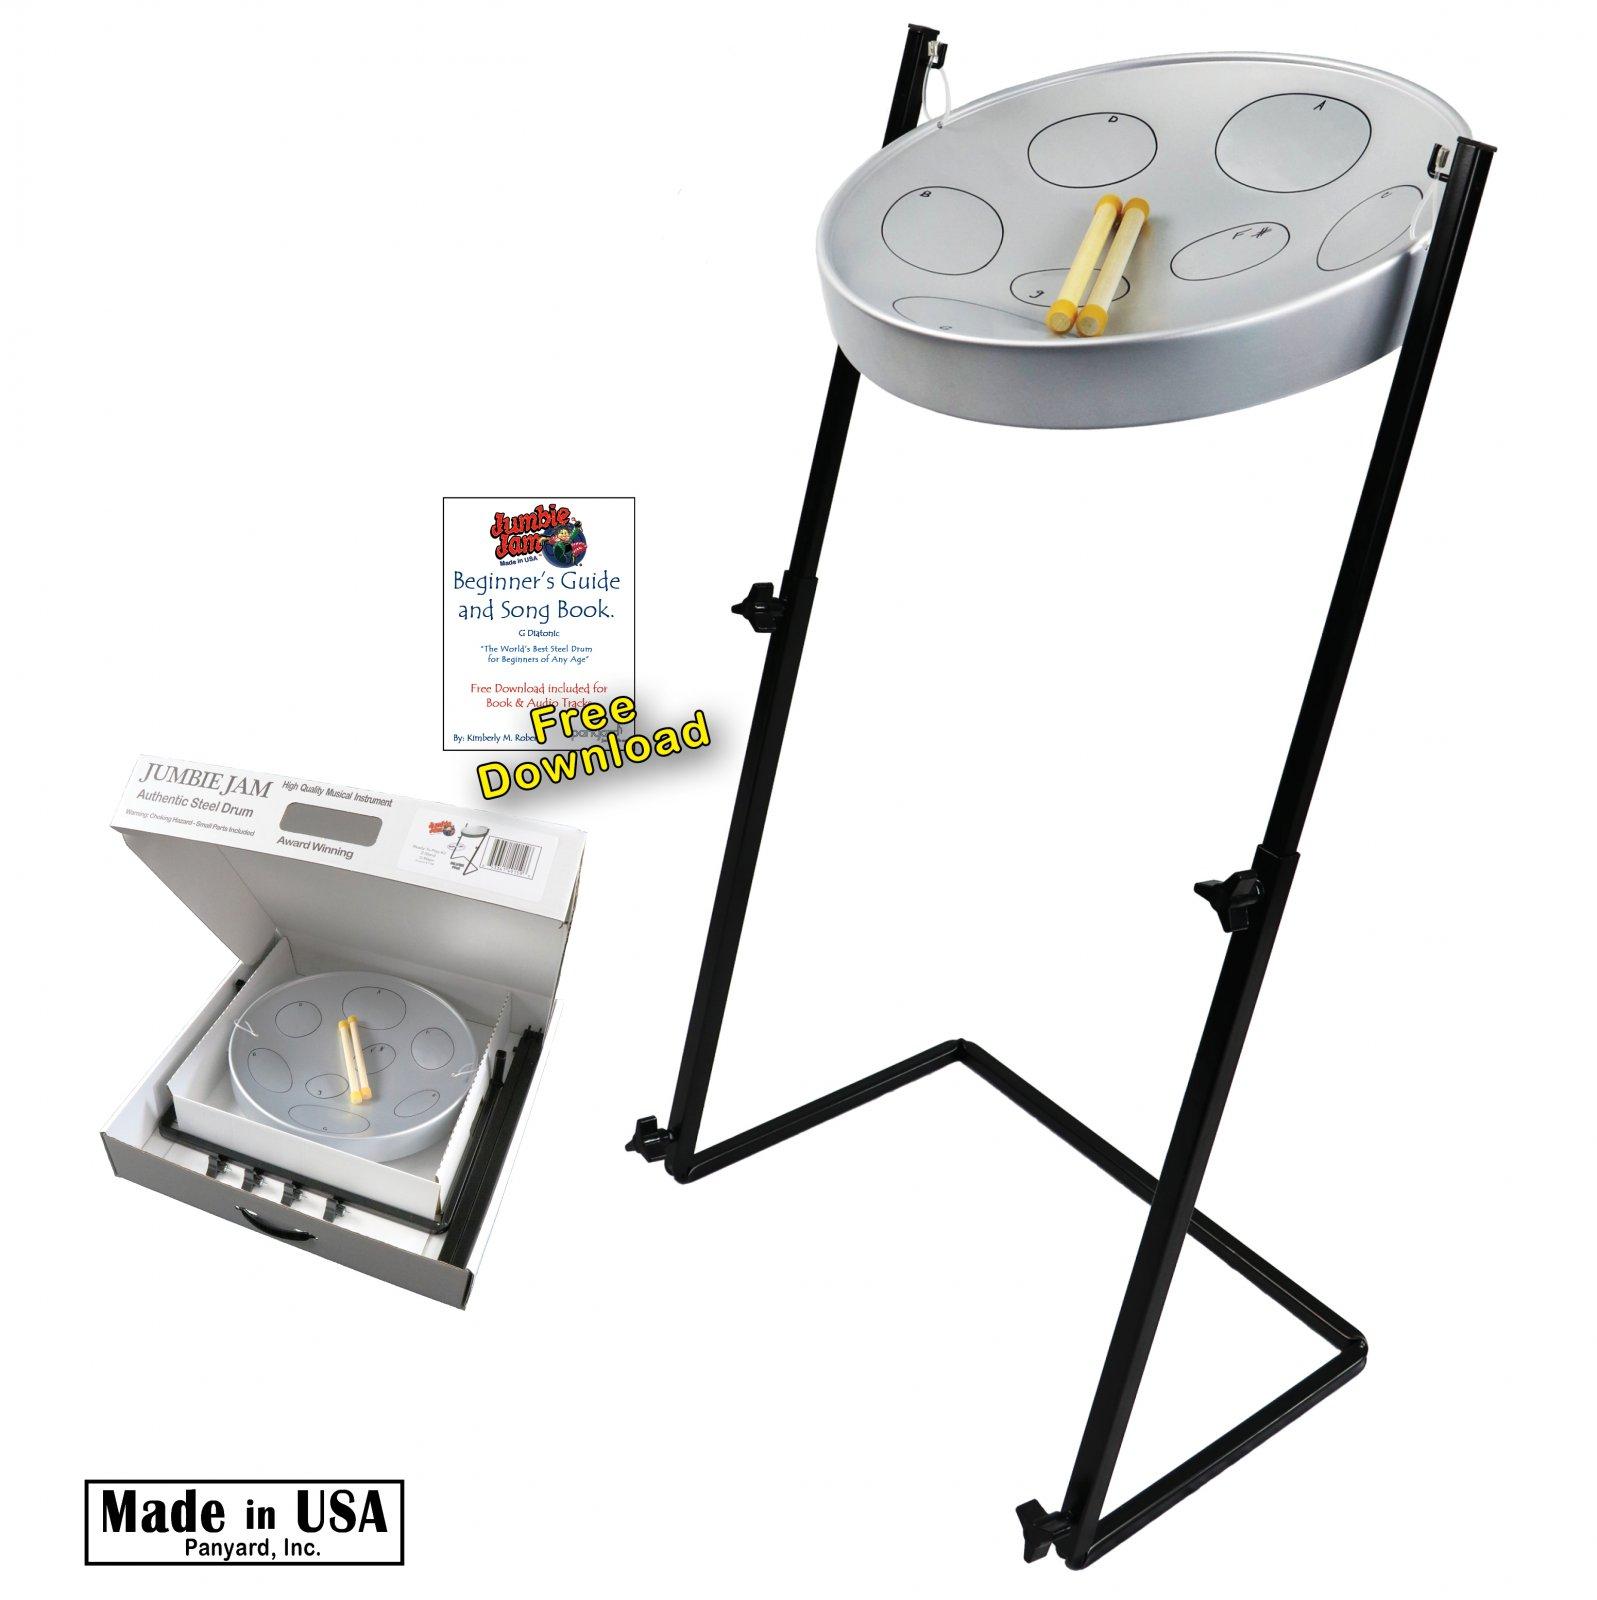 Panyard Jumbie Jam Steel Drum Ready-to-Play Kits with Metal Z-Floor Stand W1158